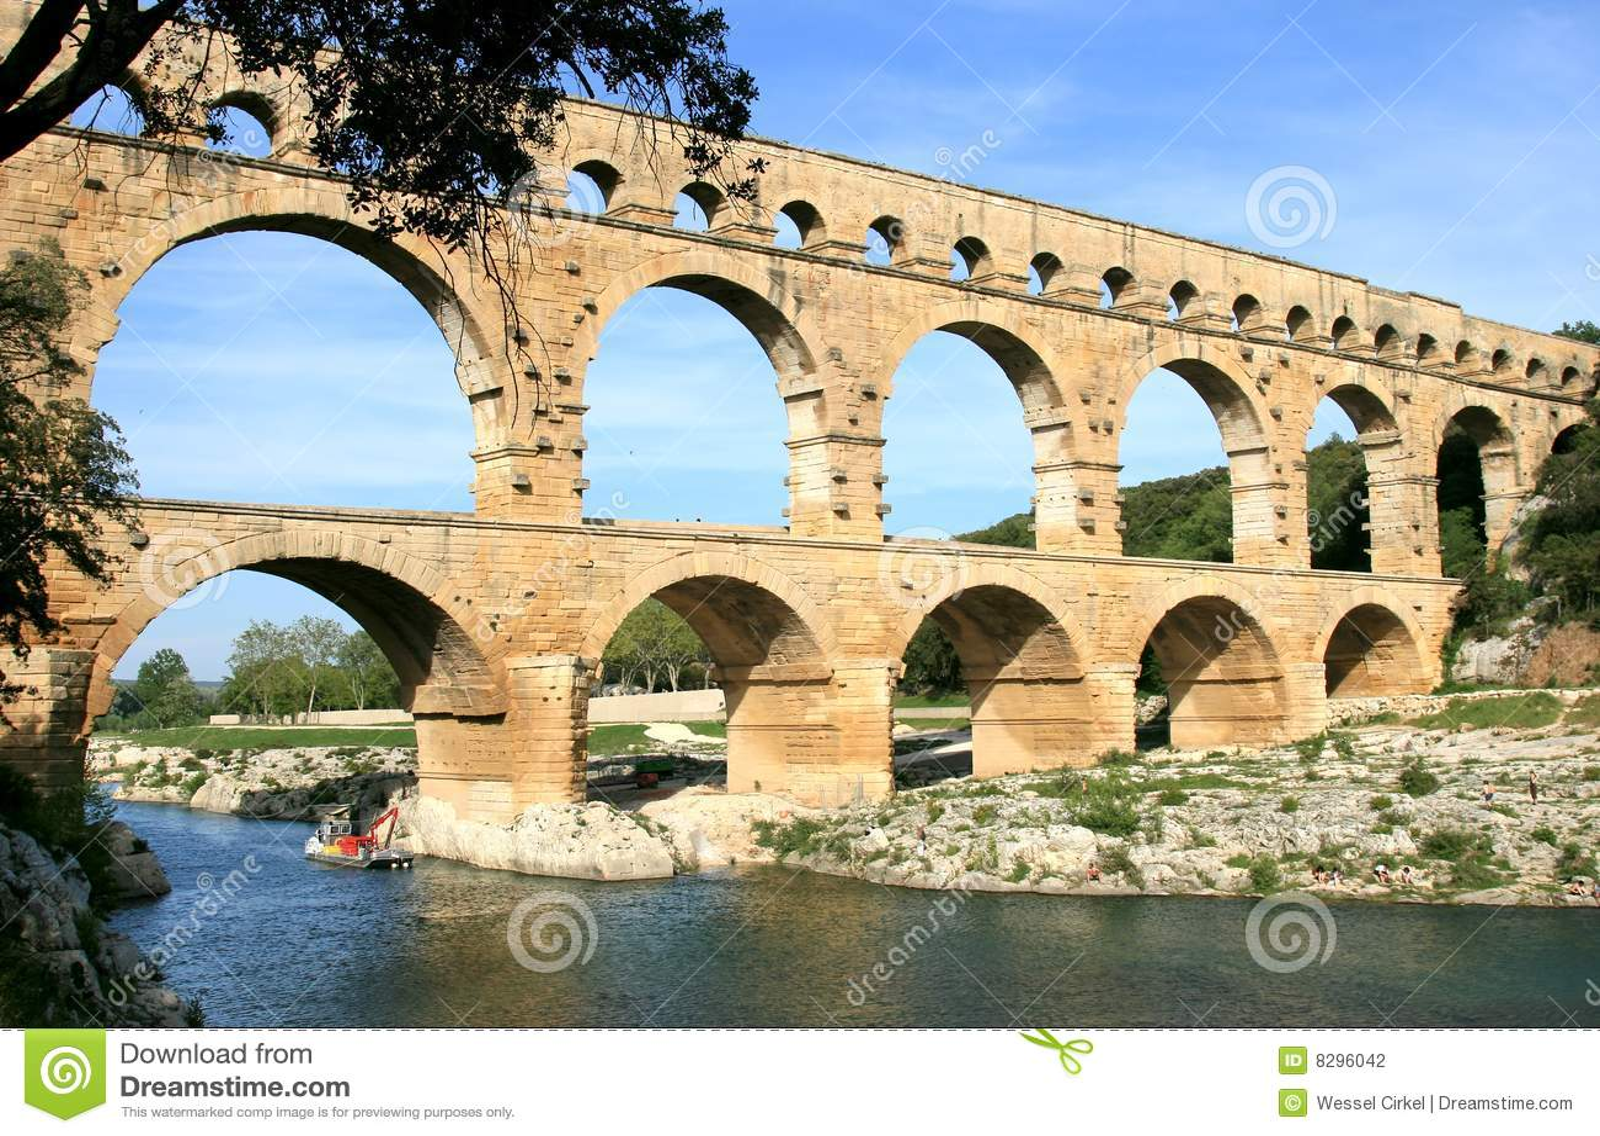 french roman aqueduct named pont du gard stock photography image